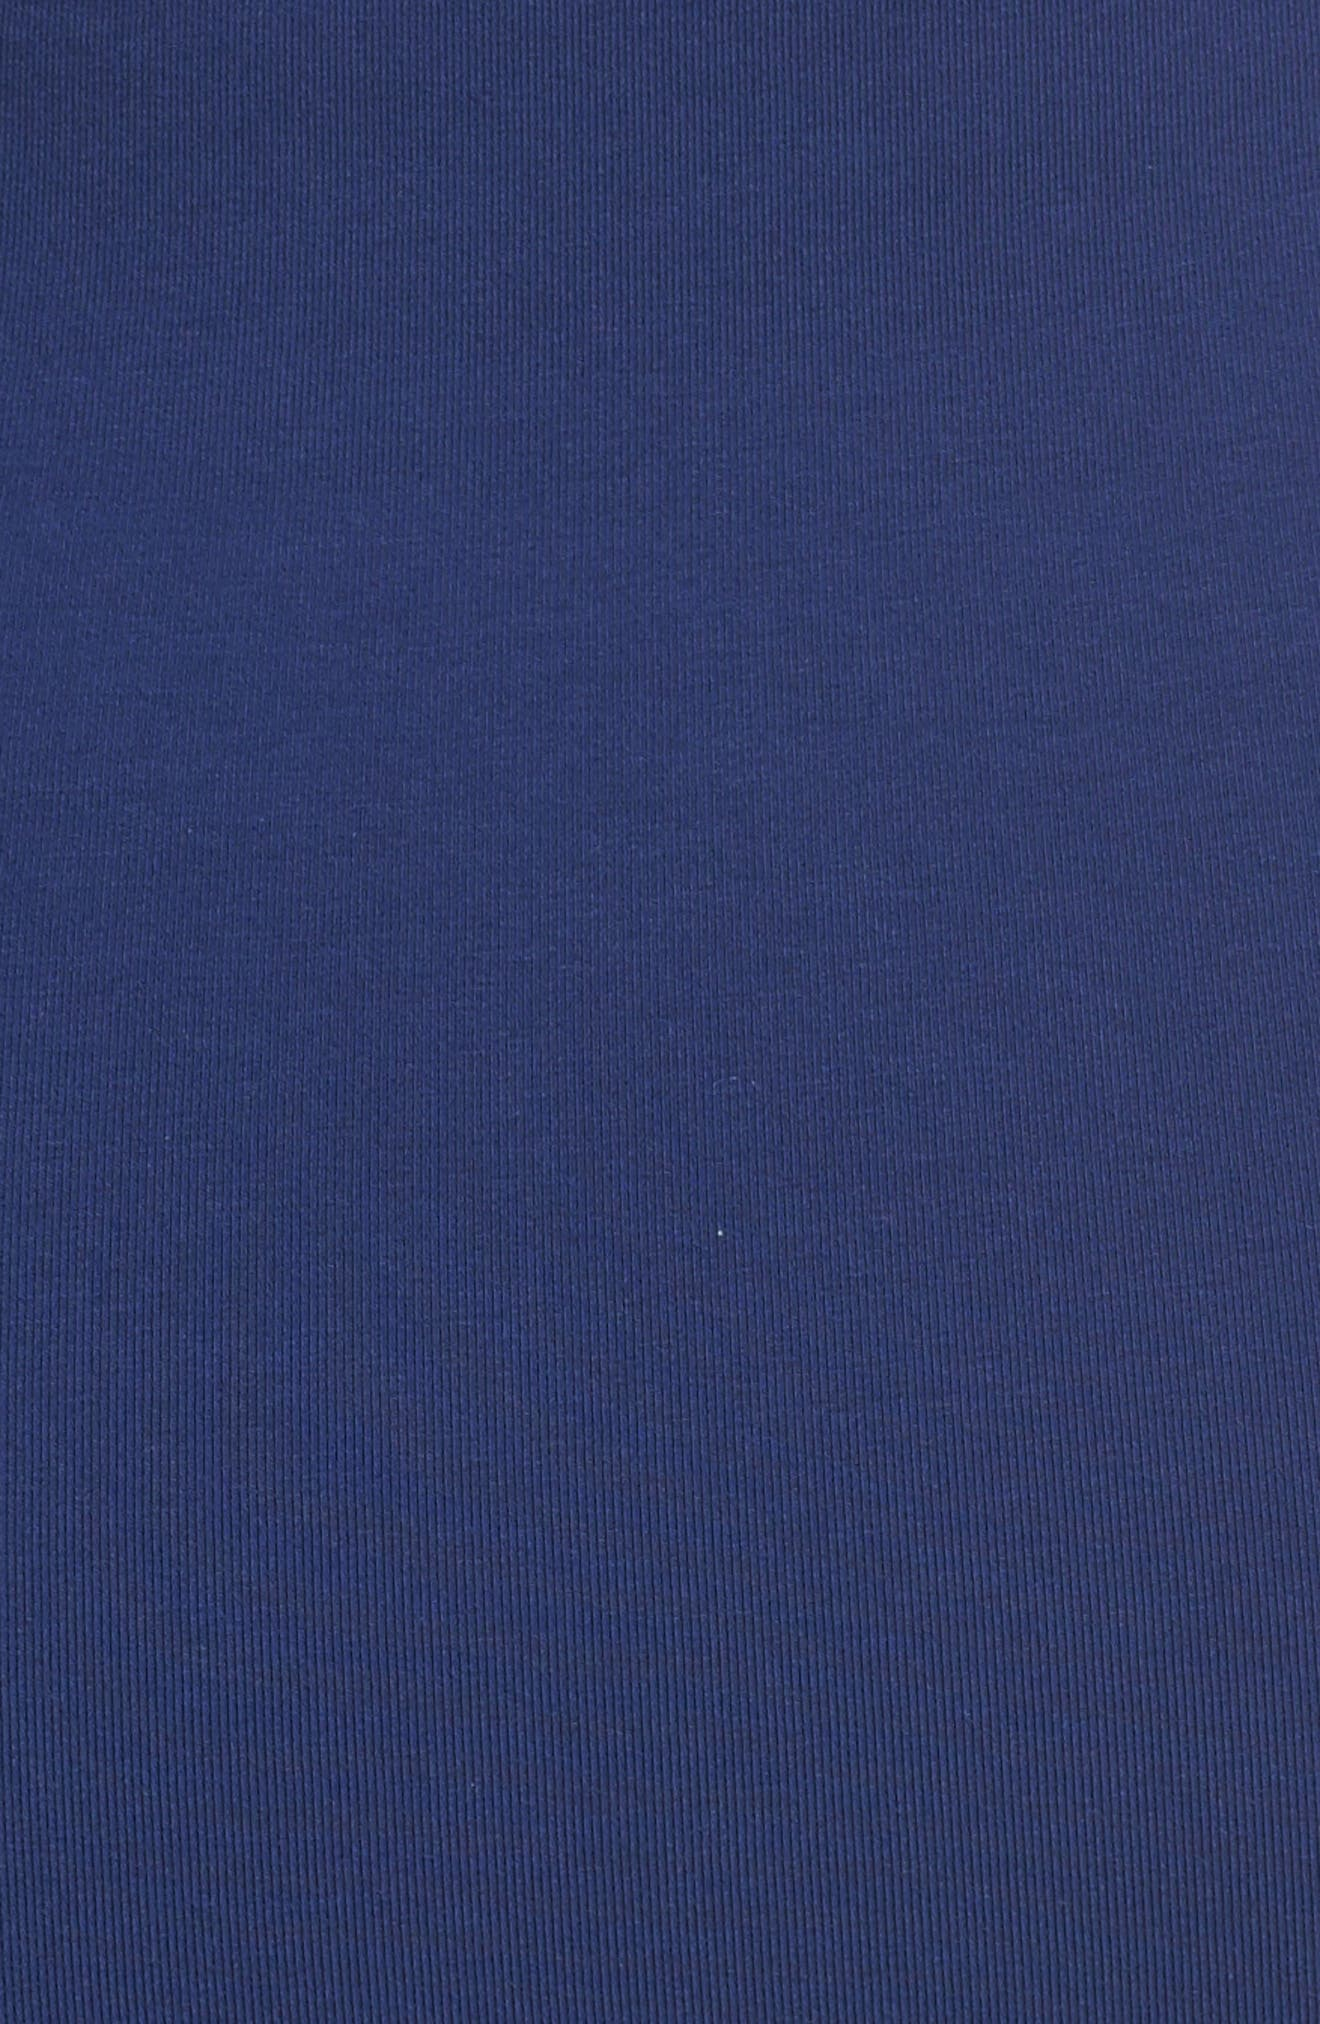 T7 Sweatshirt Dress,                             Alternate thumbnail 6, color,                             Blue Depths